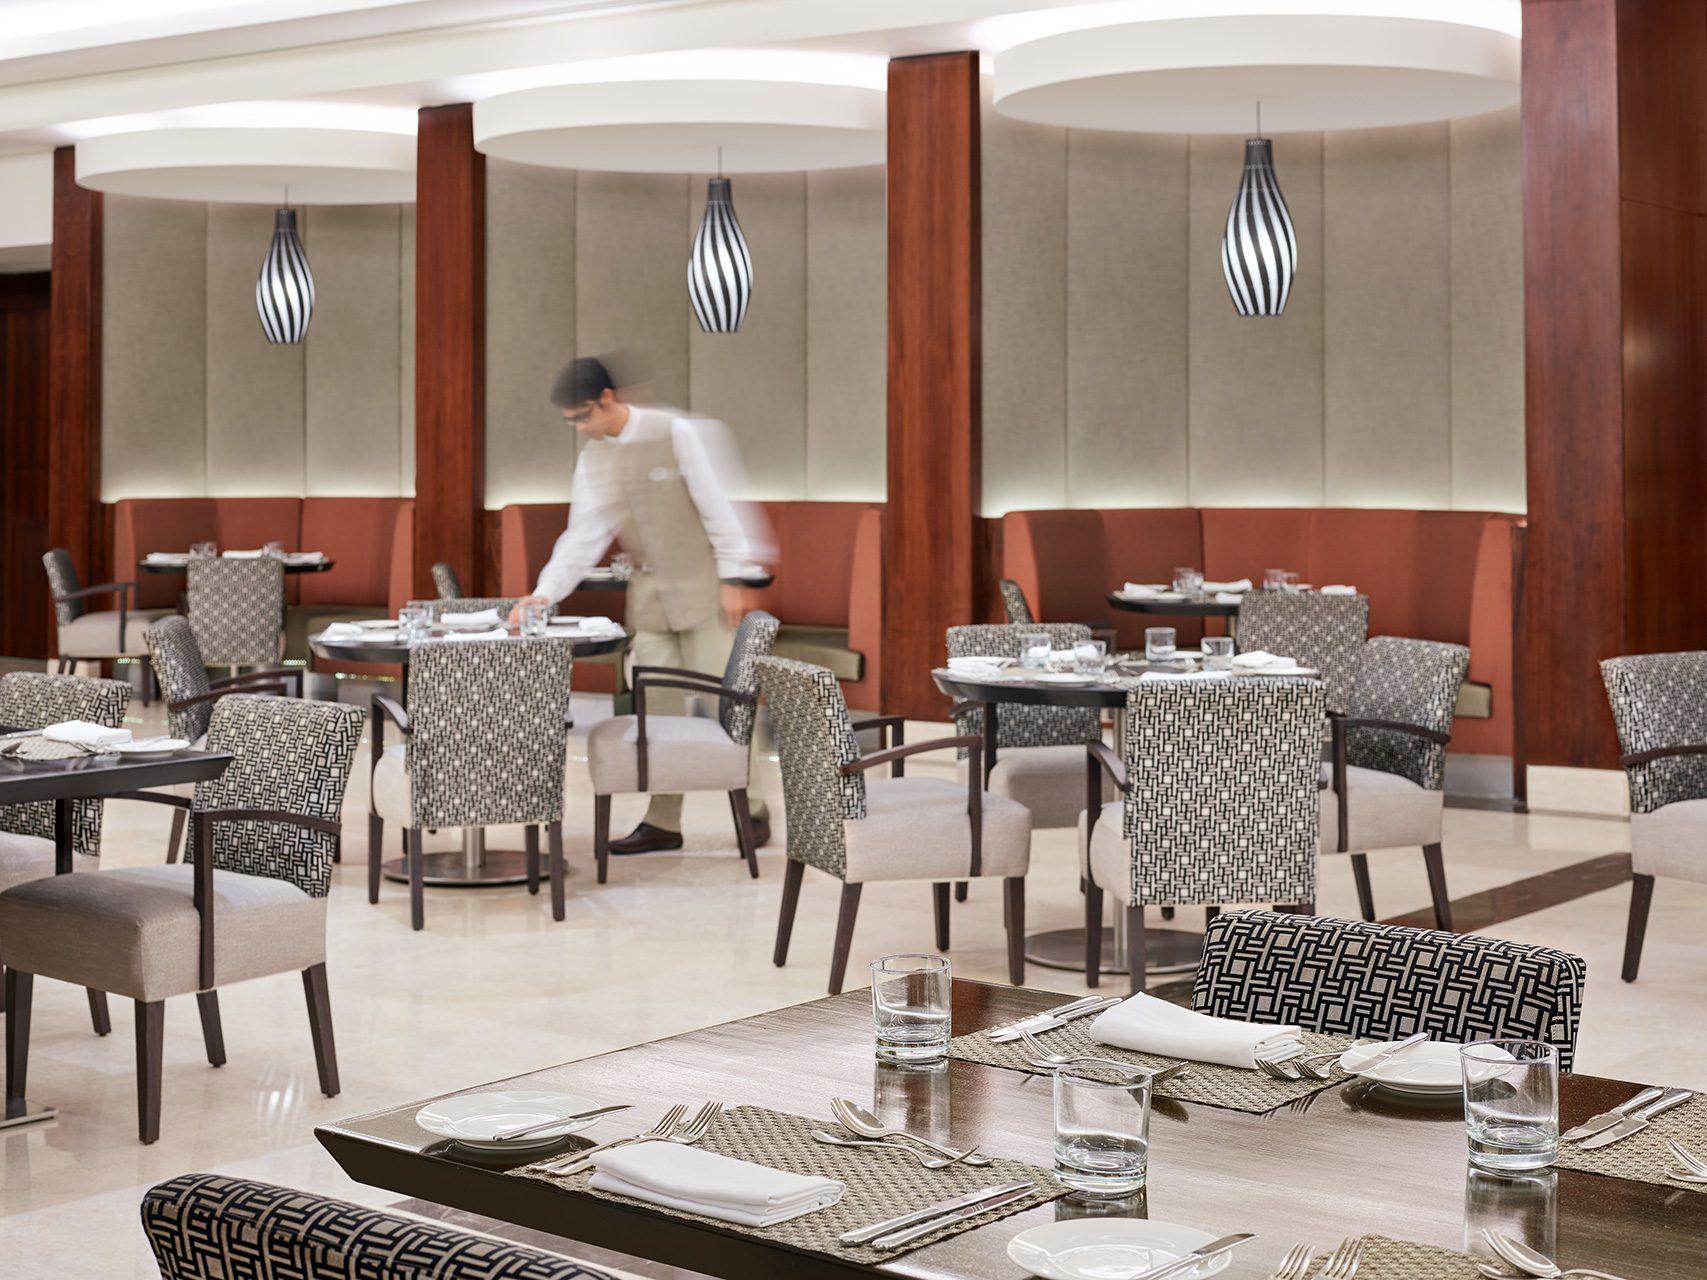 Swissotel Jeddah Hotel